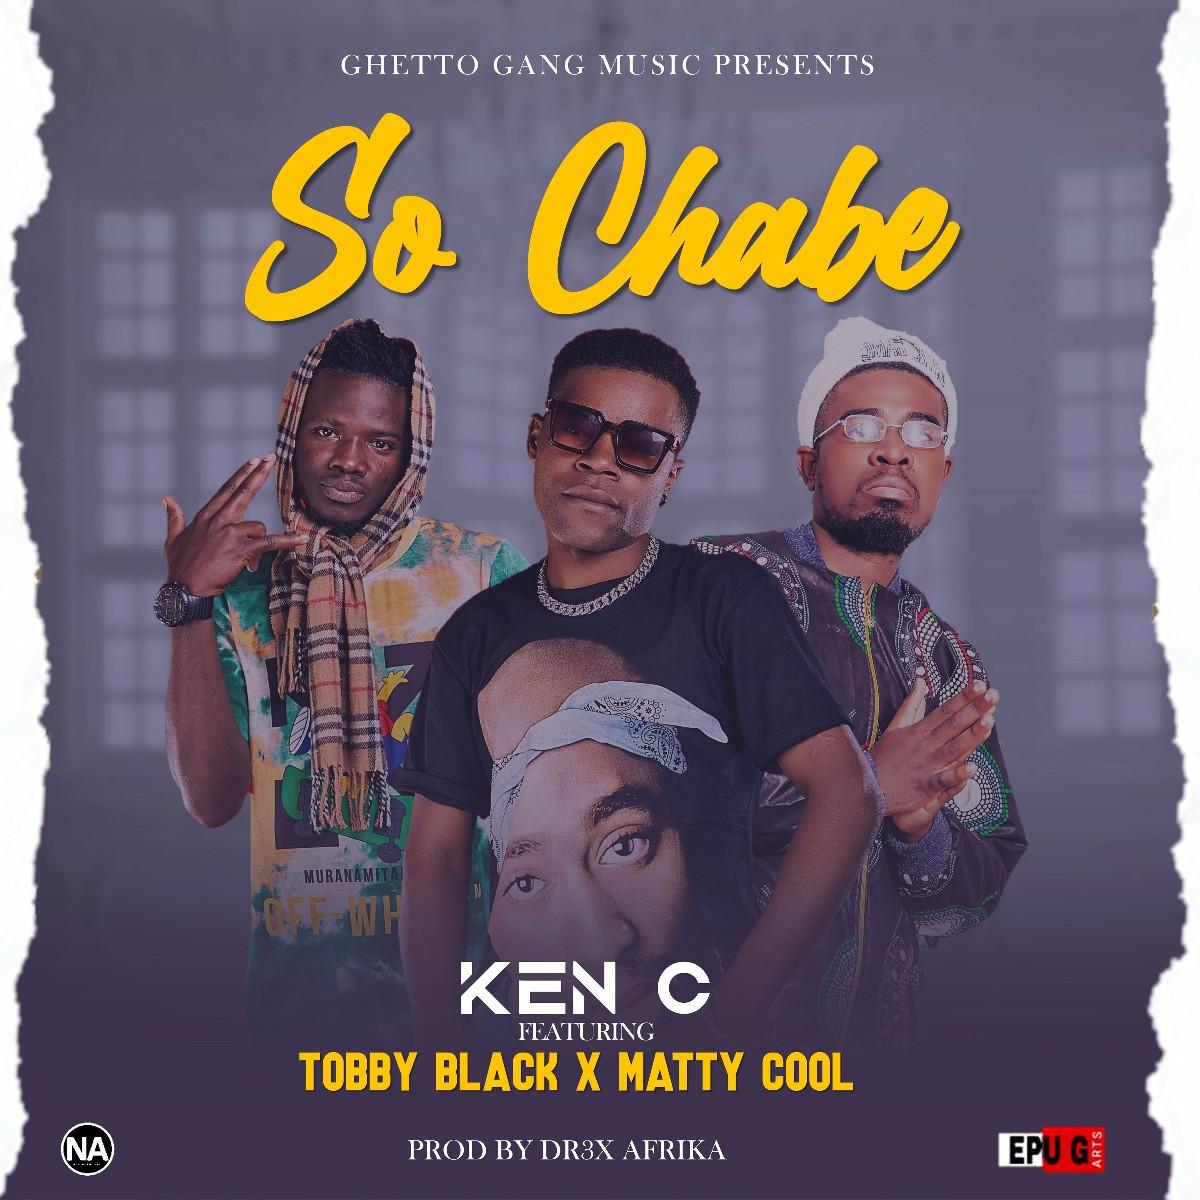 Ken C ft. Tobby Black & Matty Cool - So Chabe